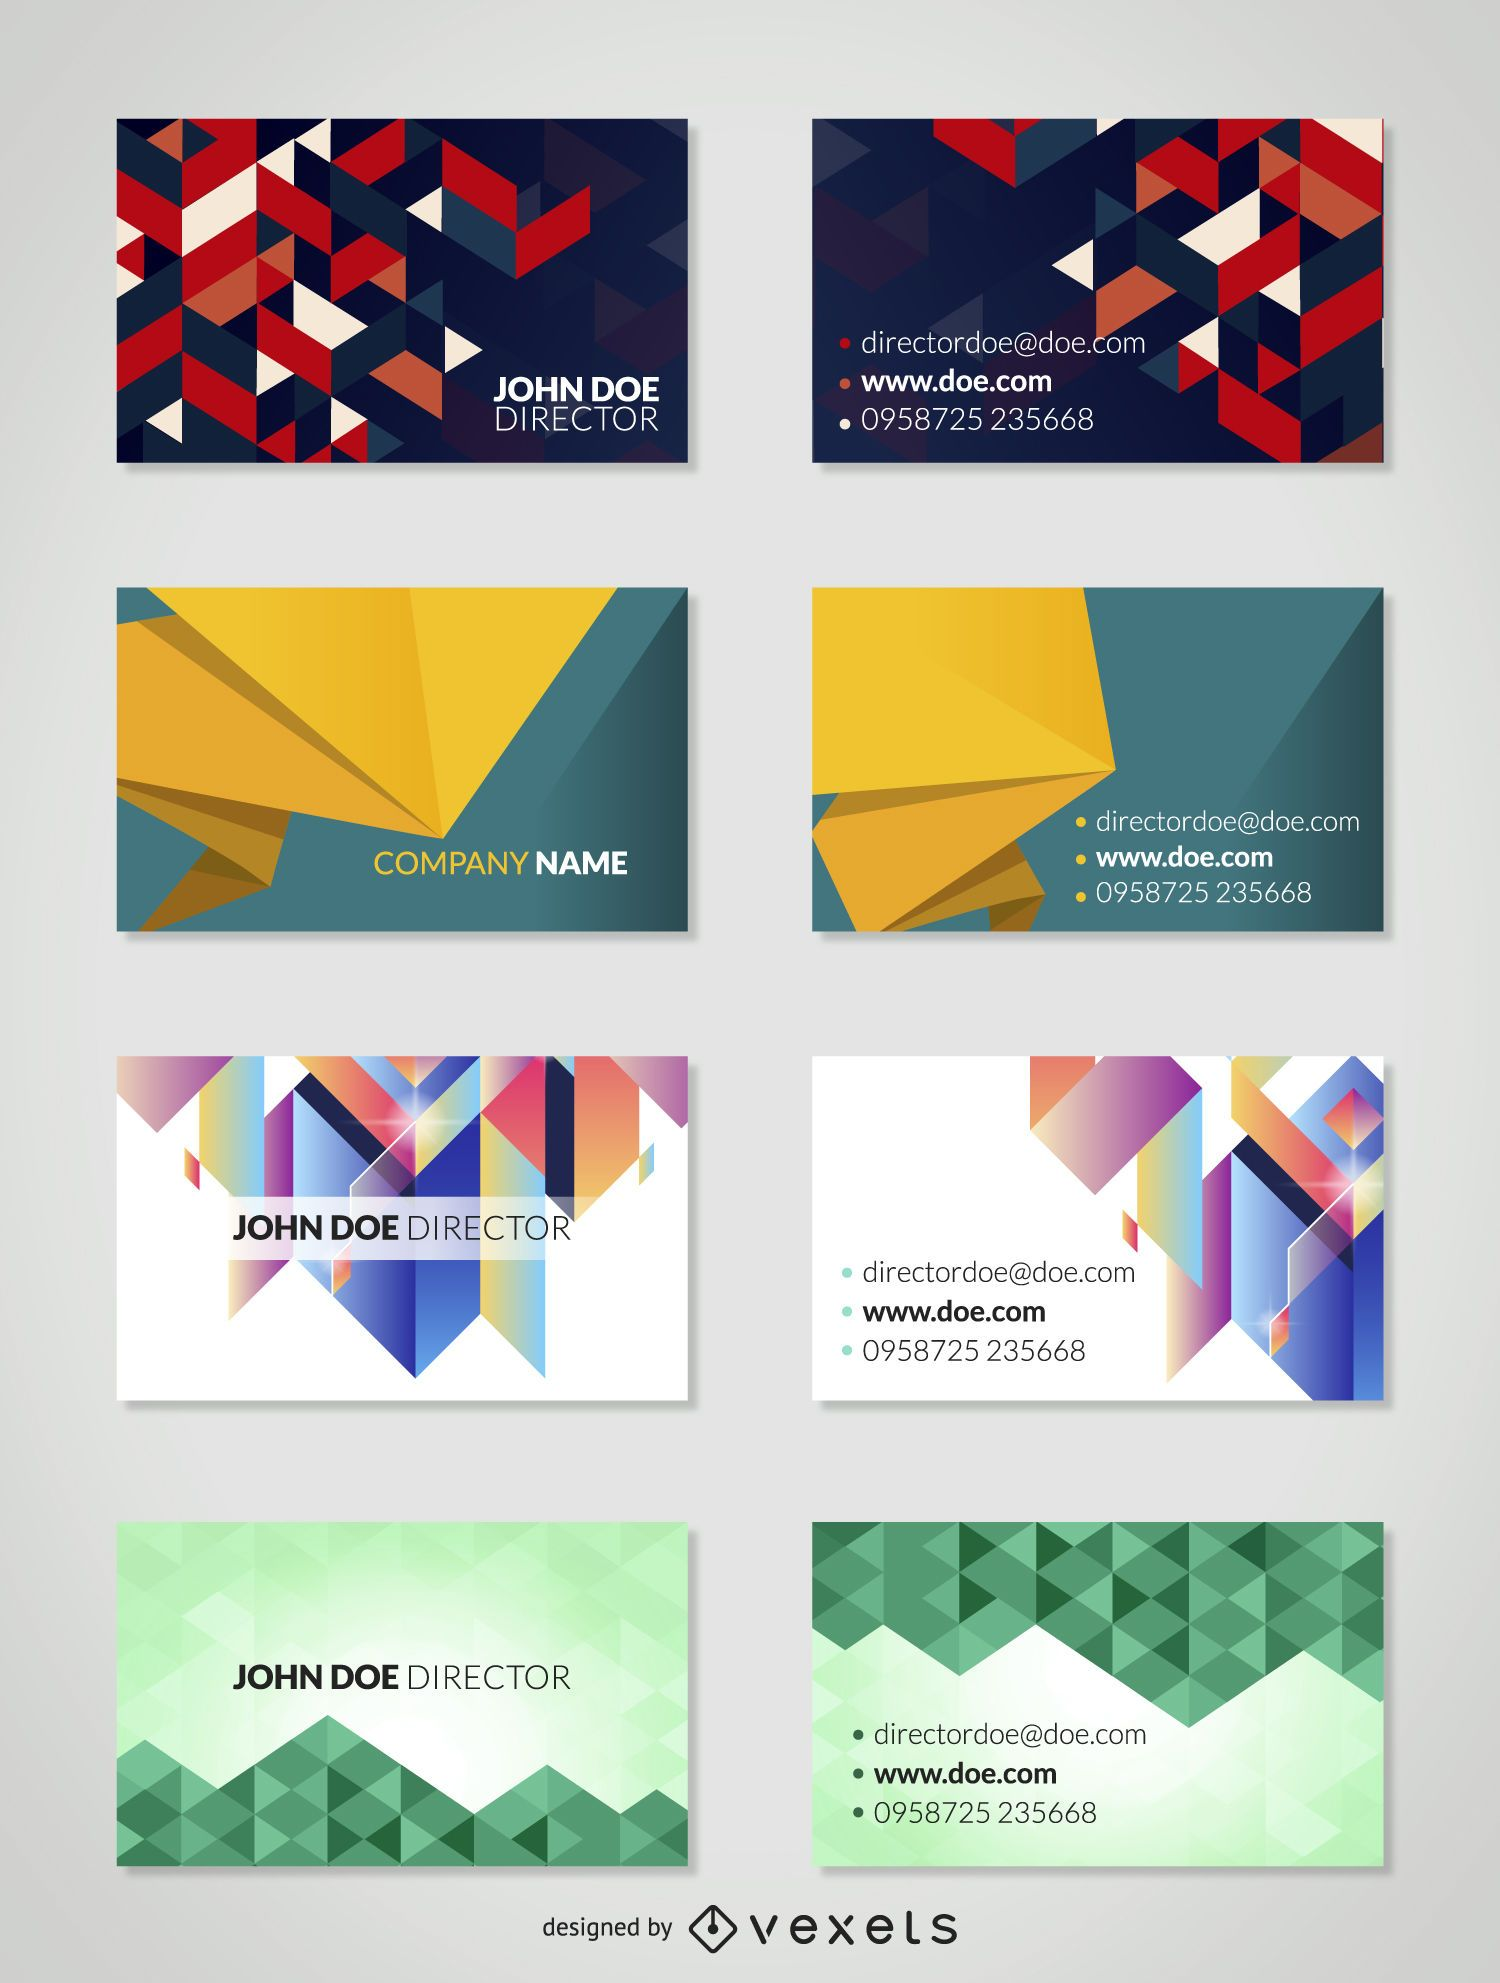 Business card psd mockup psd download geometric business card mockup reheart Choice Image